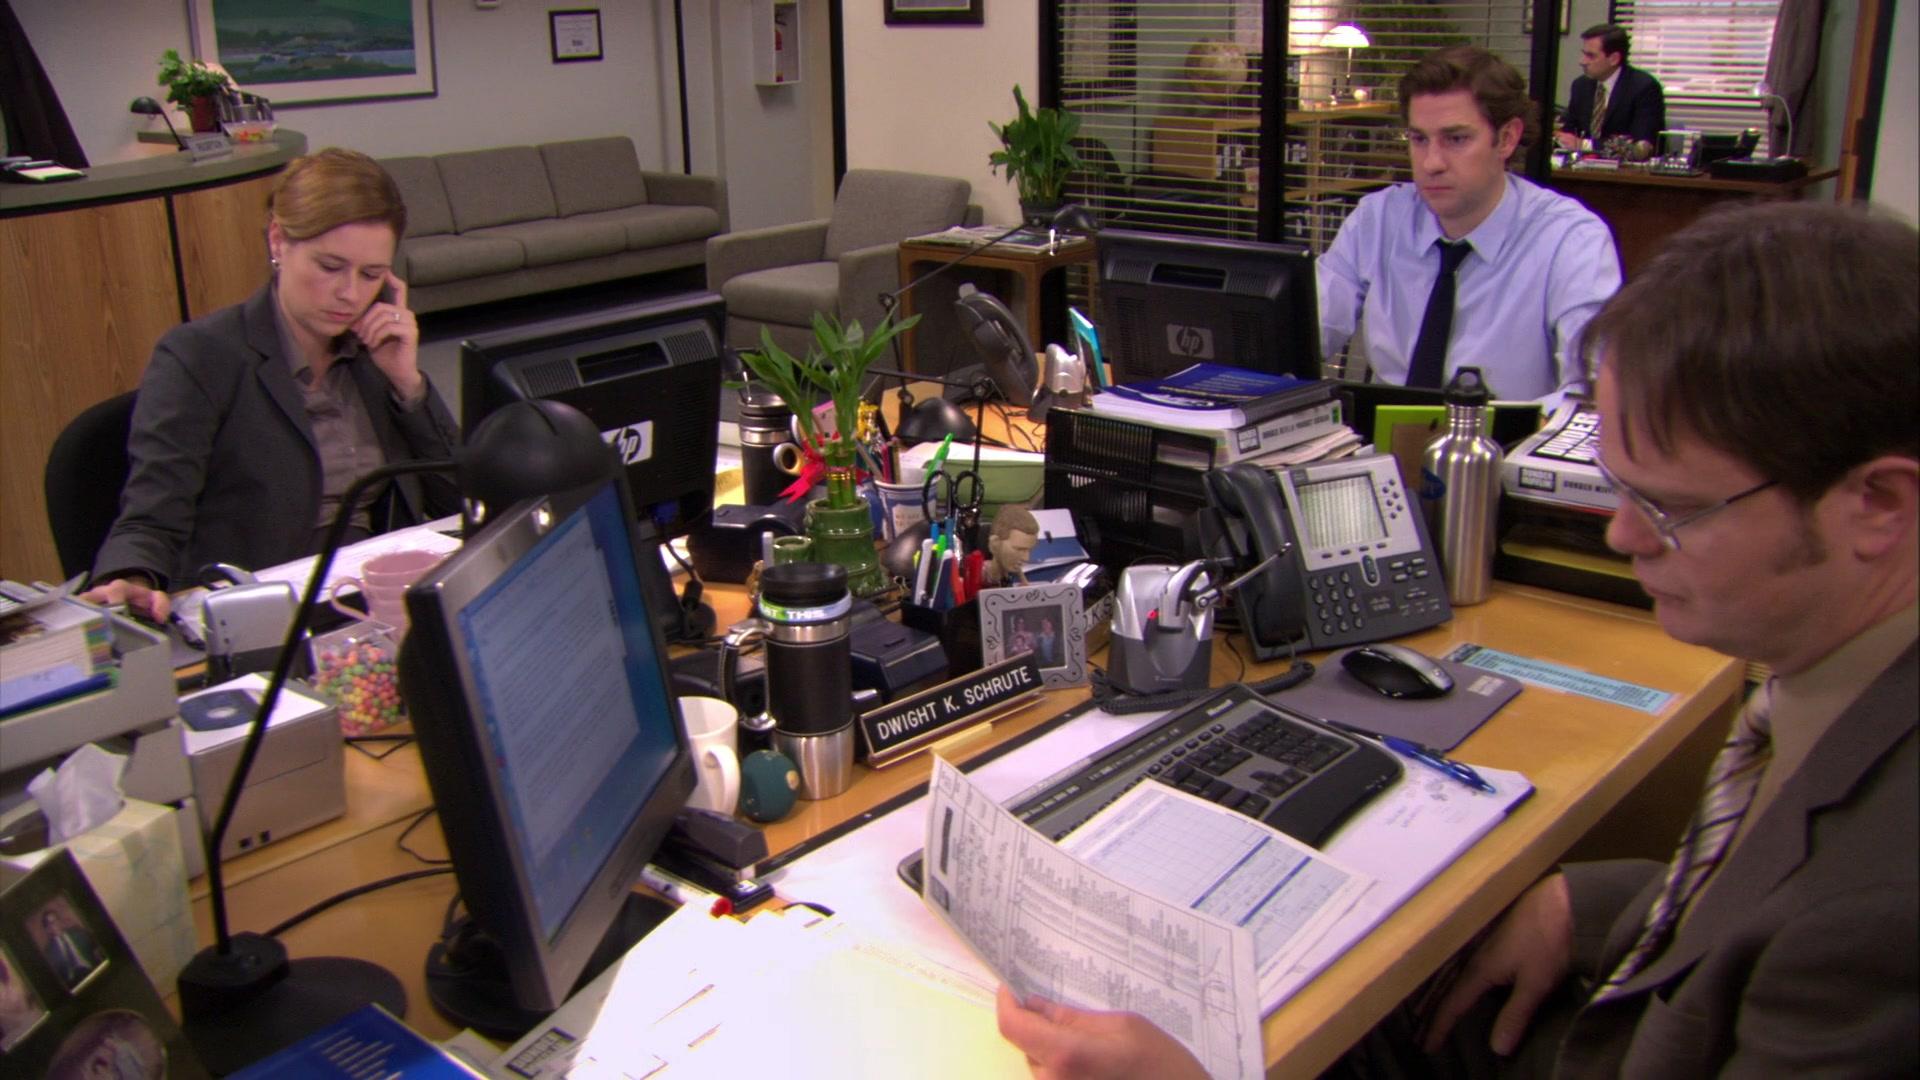 HP Monitor & Cisco Phone Used by Rainn Wilson (Dwight